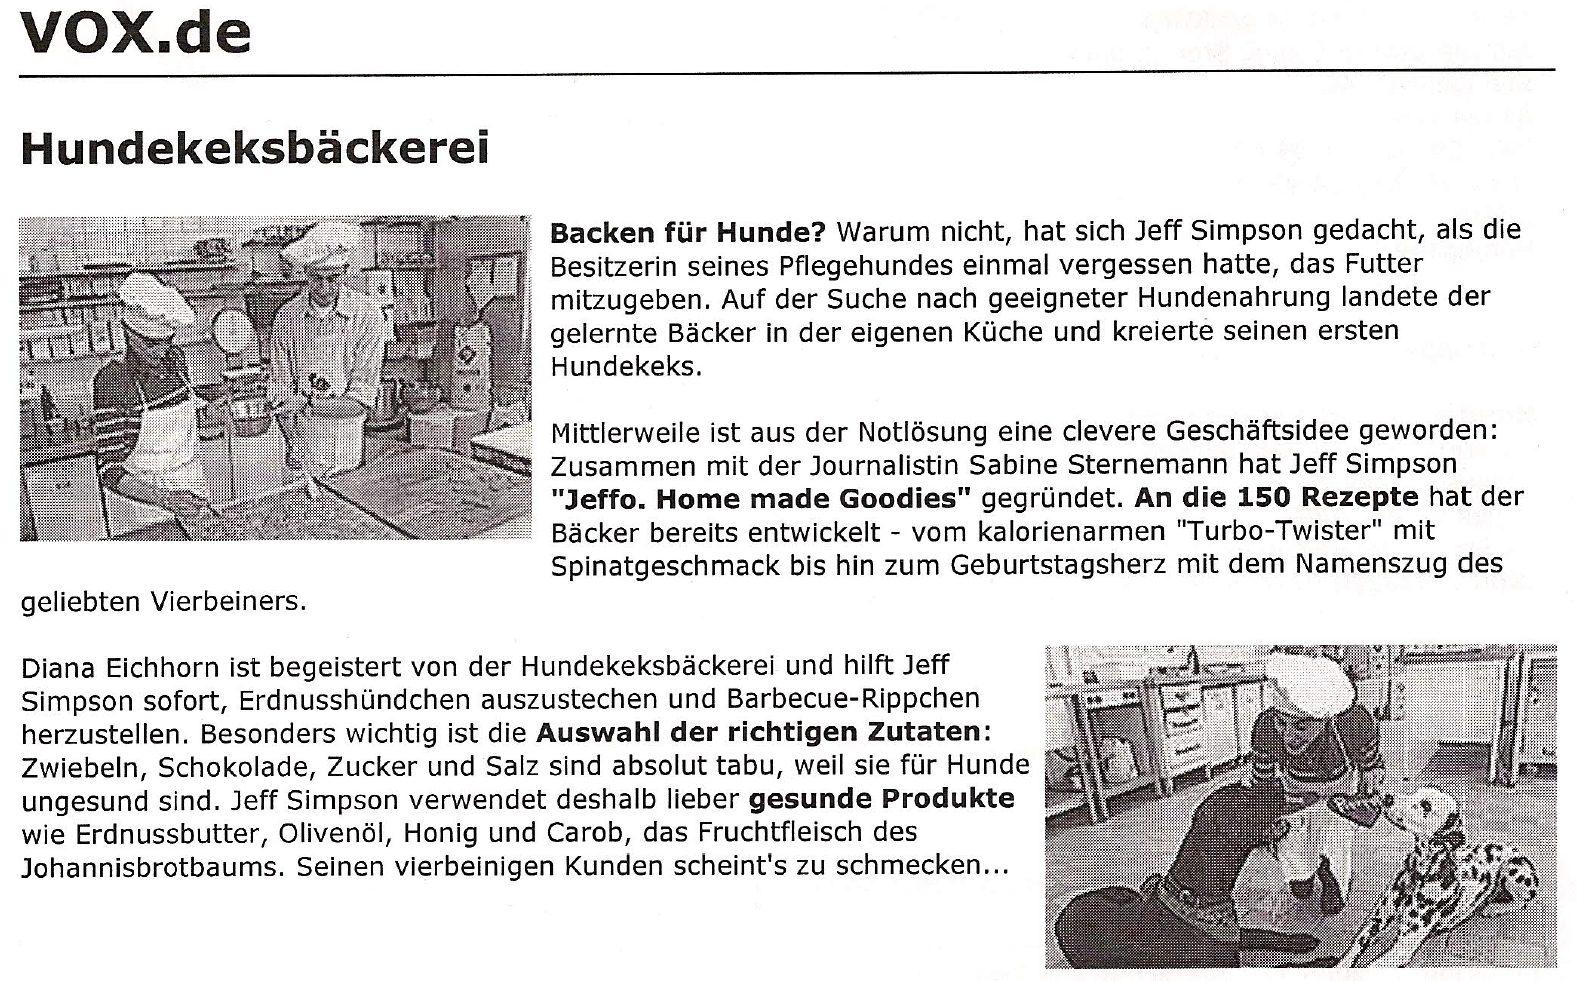 Presseschau Vox Fernsehen Hundekeksbäckerei